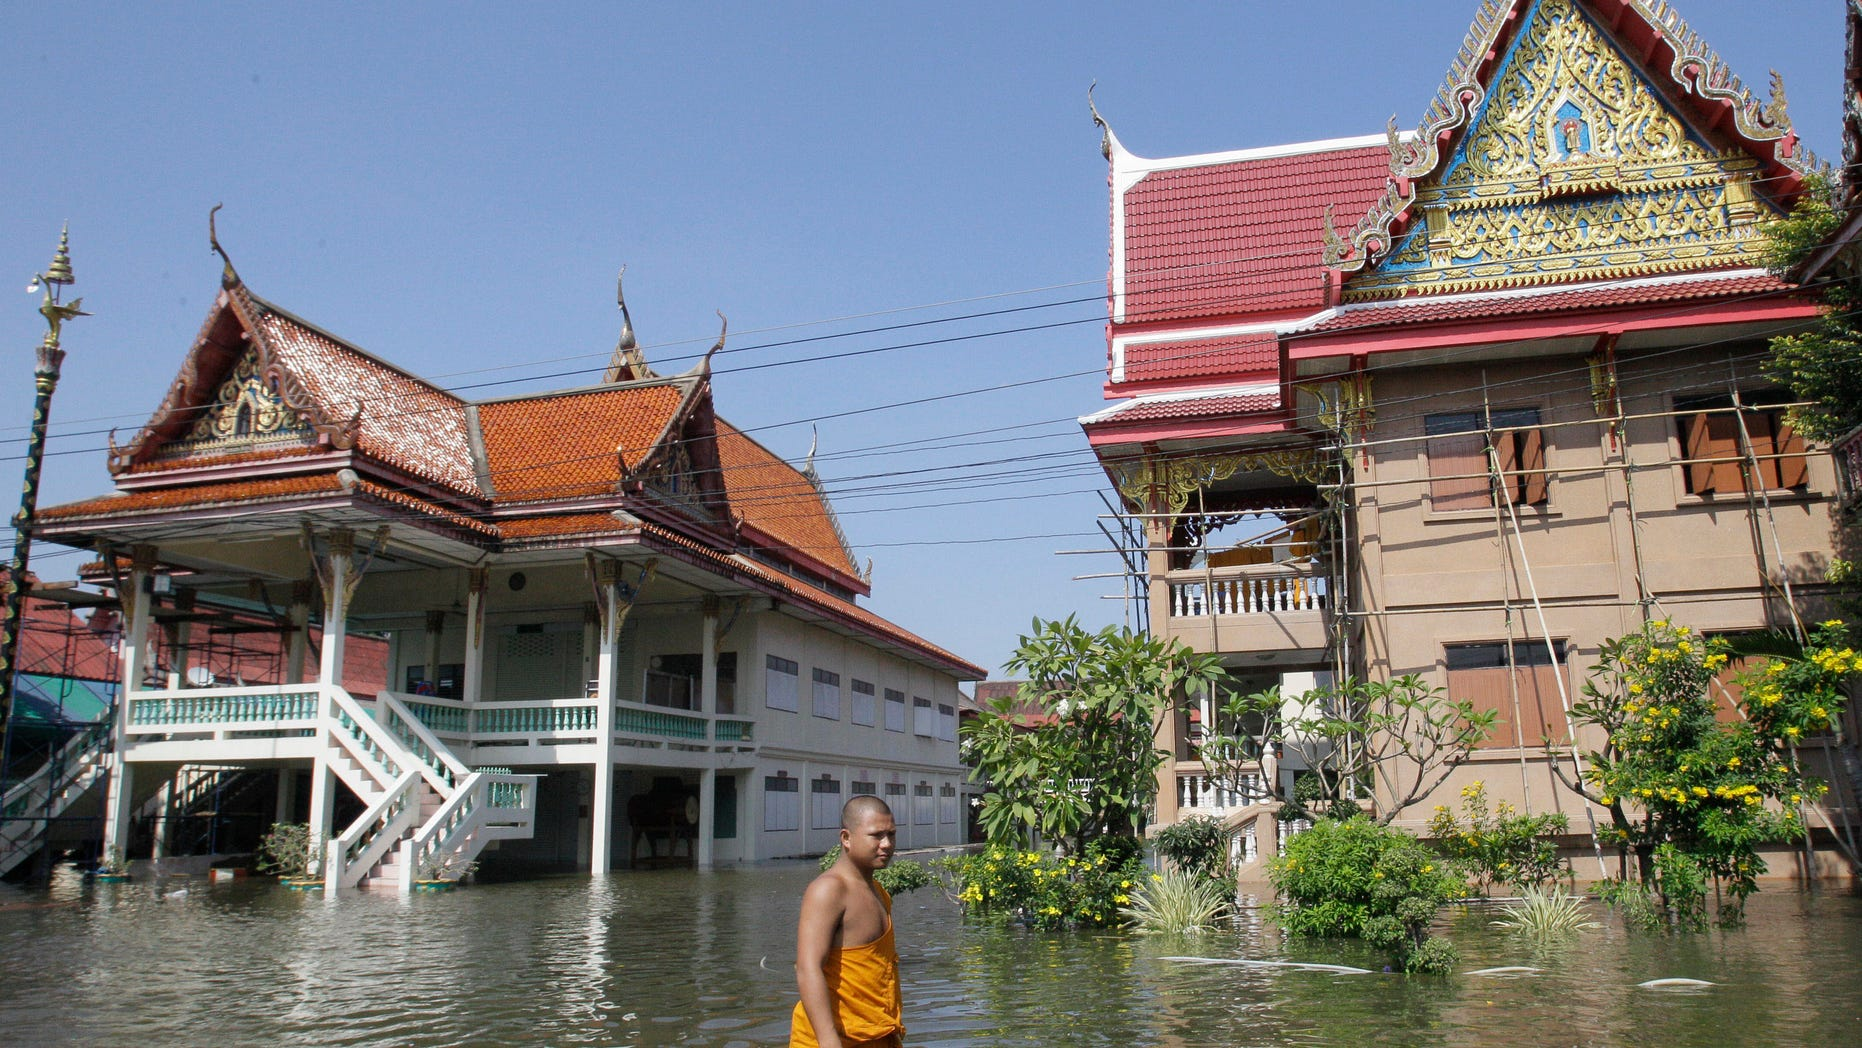 Oct. 19, 2011: Thai Buddhist monk wades through a flooded street at Ban Kadee temple in Phatum Thani province, north of Bangkok ,Thailand.